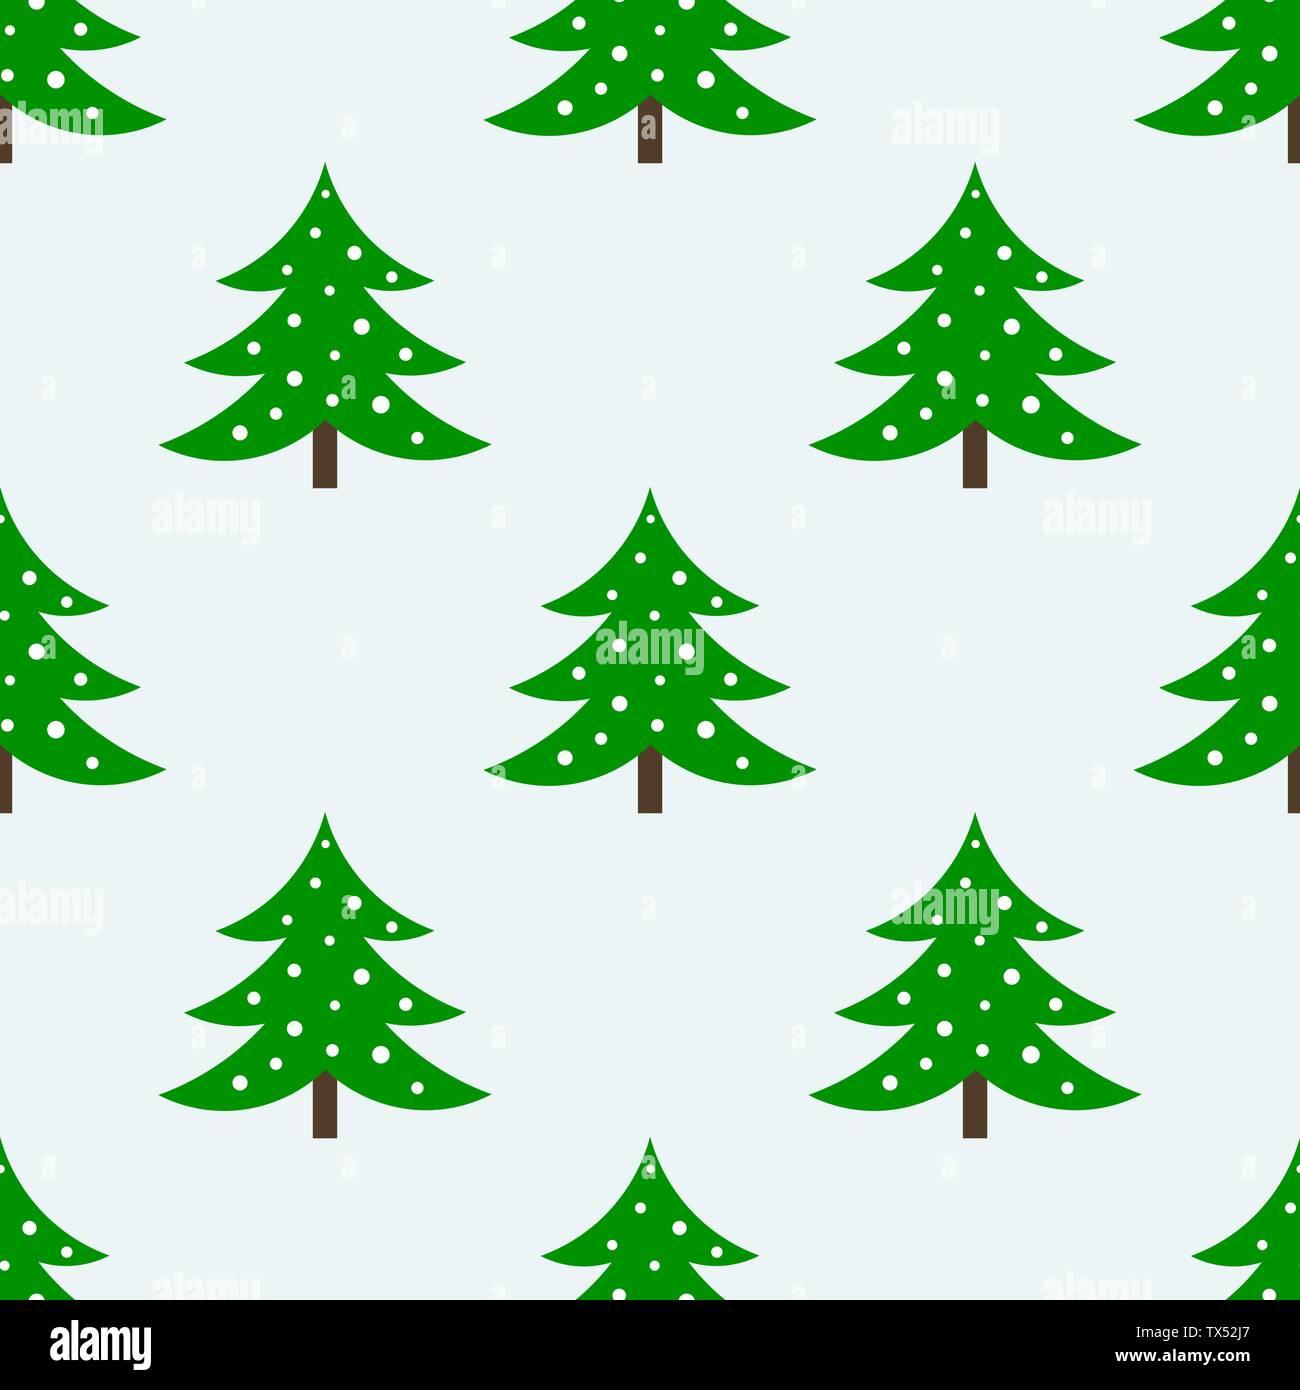 Christmas trees seamless pattern - Stock Image